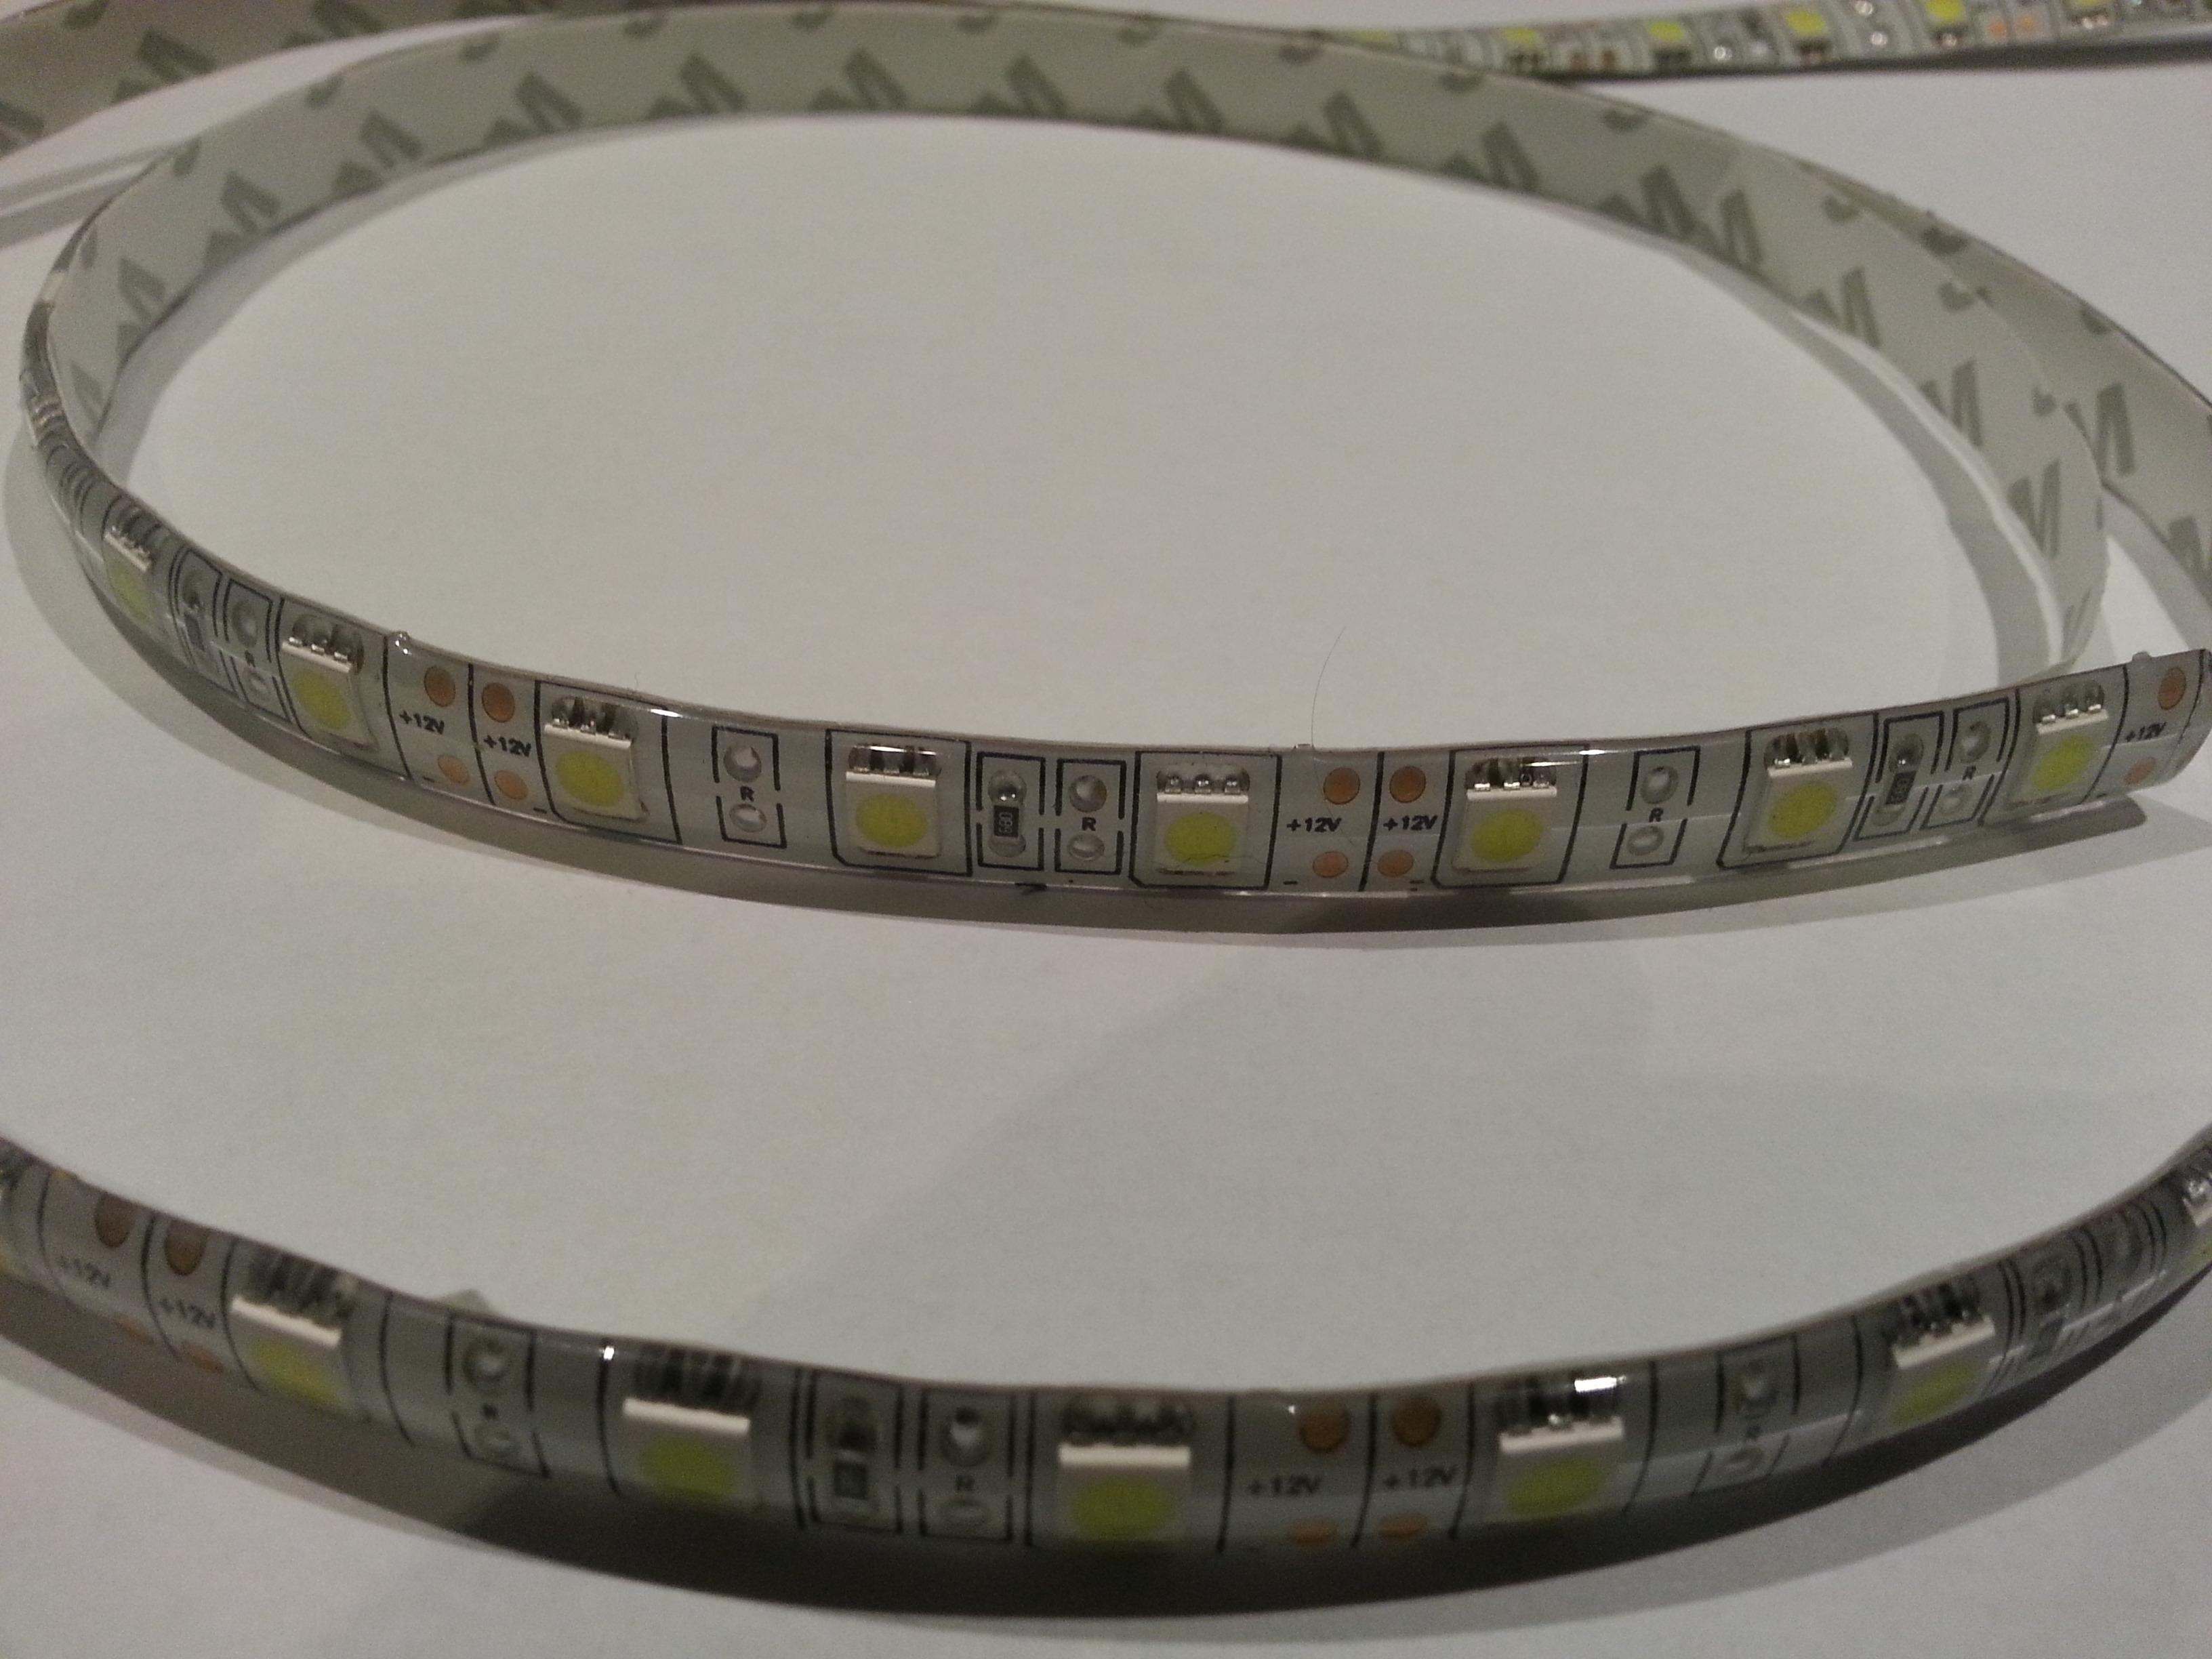 Koud Wit Licht : Led strip 14.4 w m 60 leds m koud wit rebulb.be